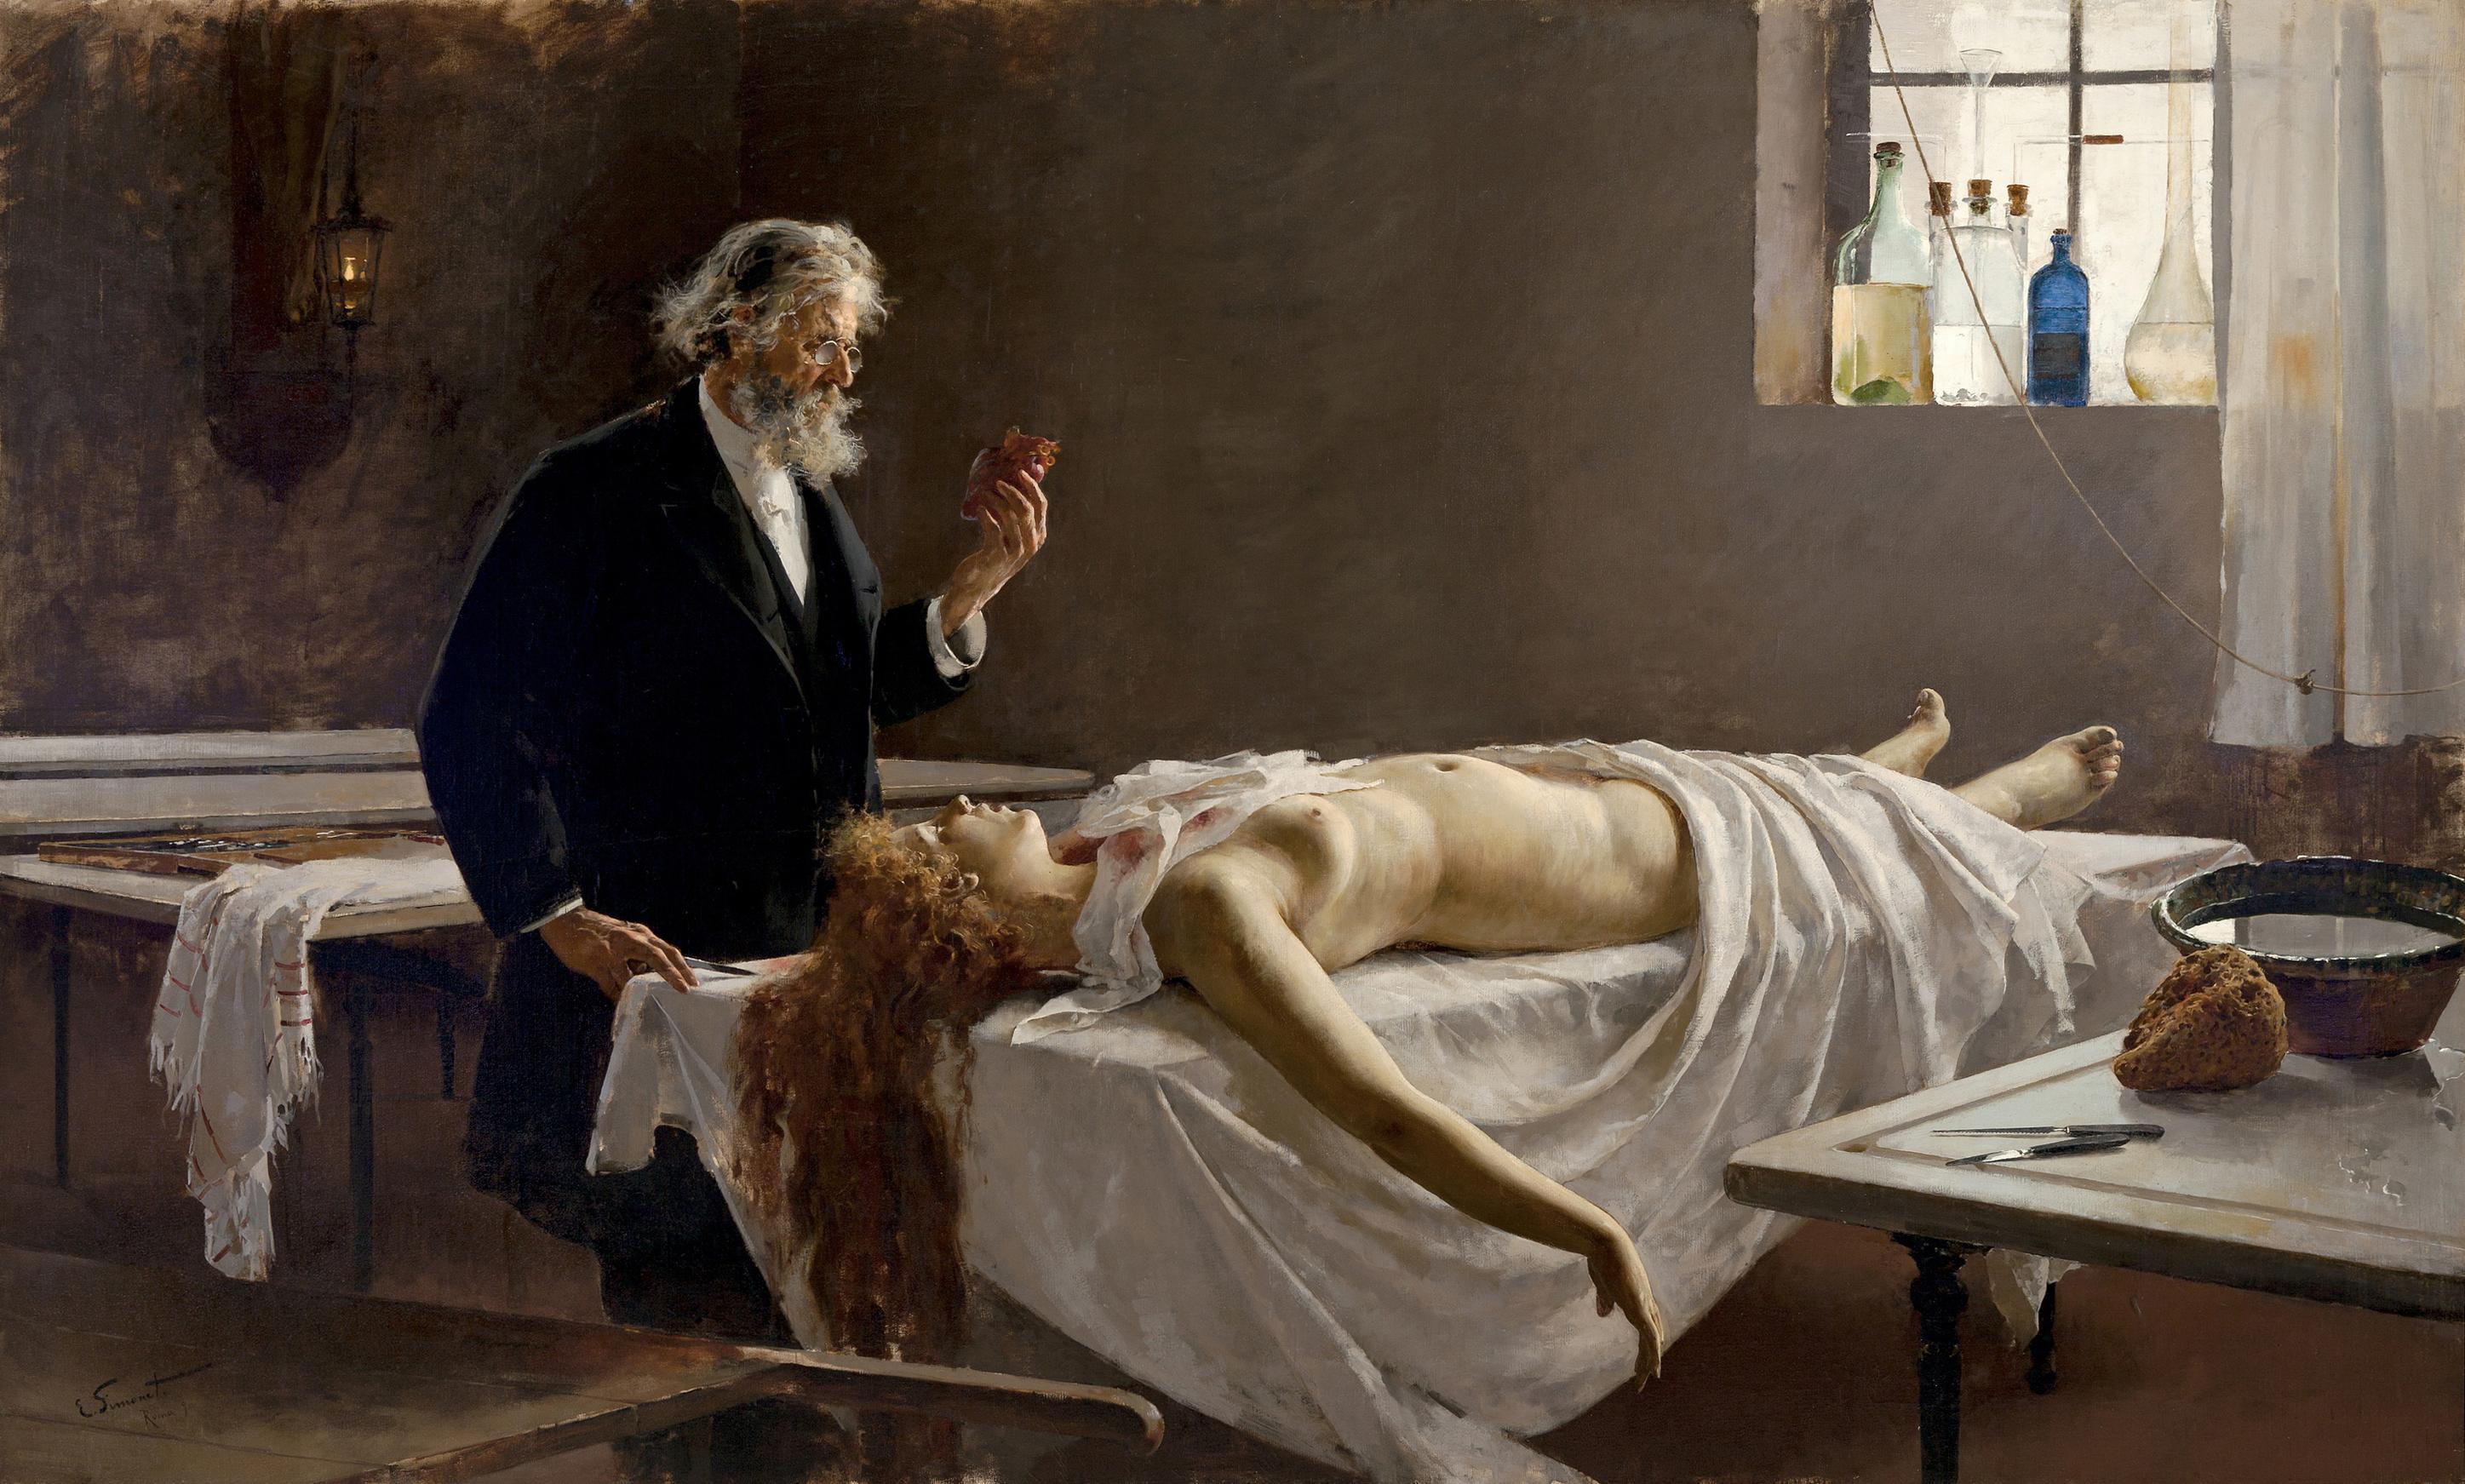 Depiction of Historia natural de la enfermedad